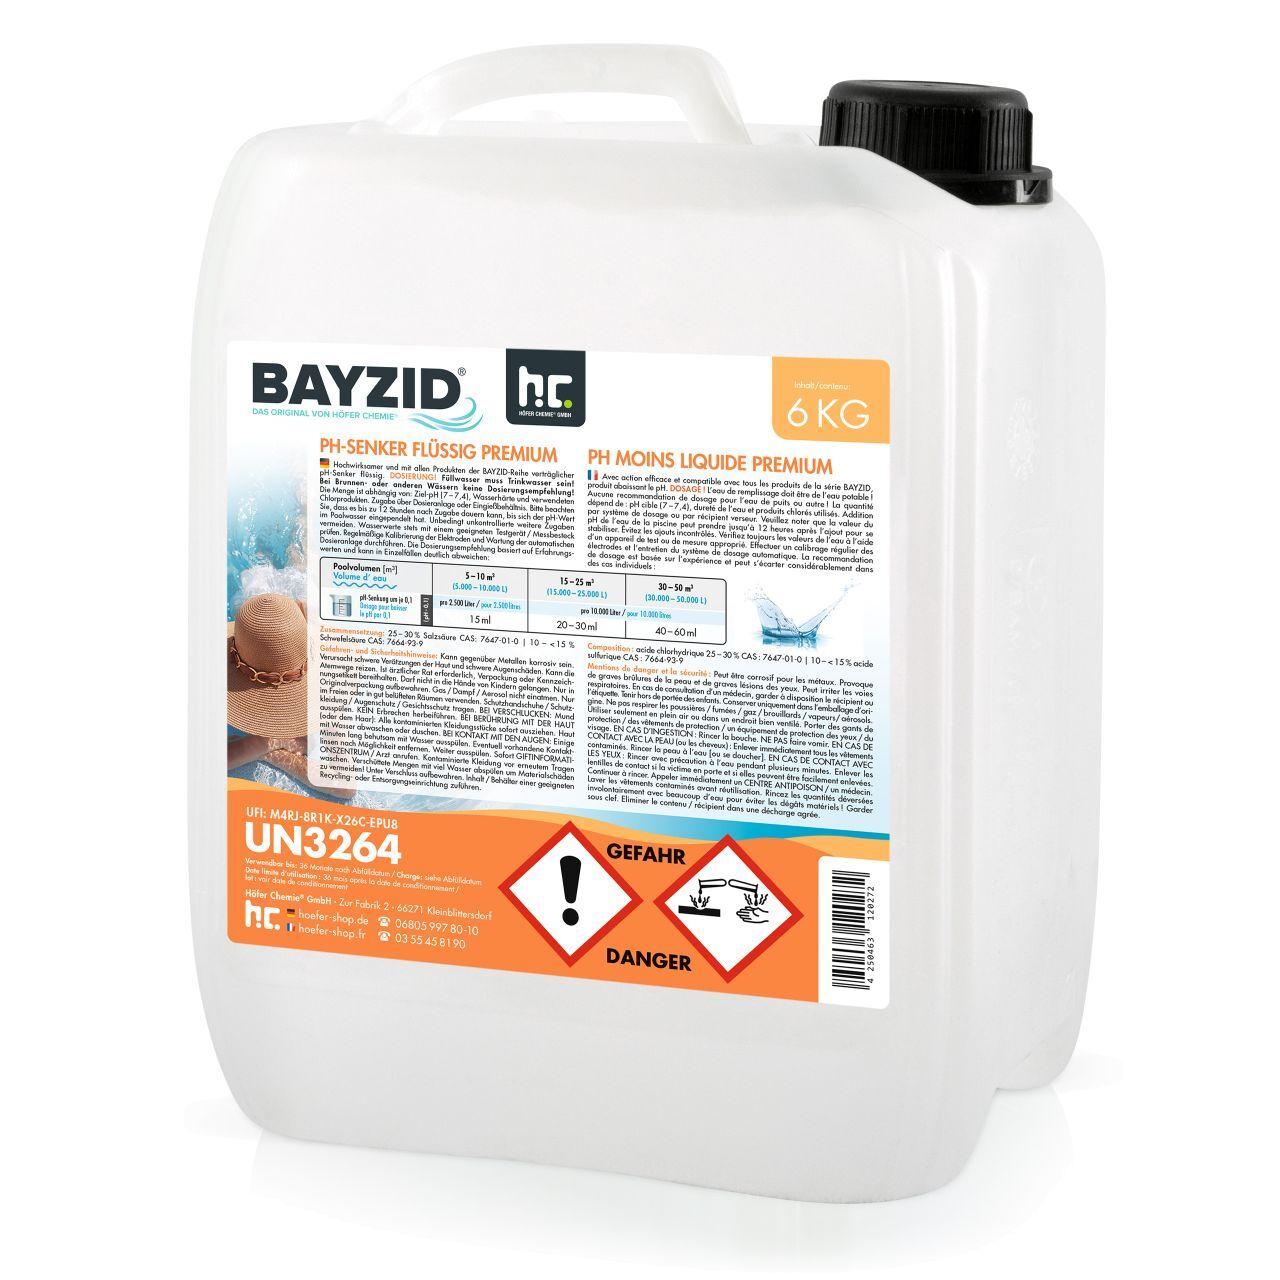 BAYZID 24 kg pH moins liquide (4 x 6 kg)